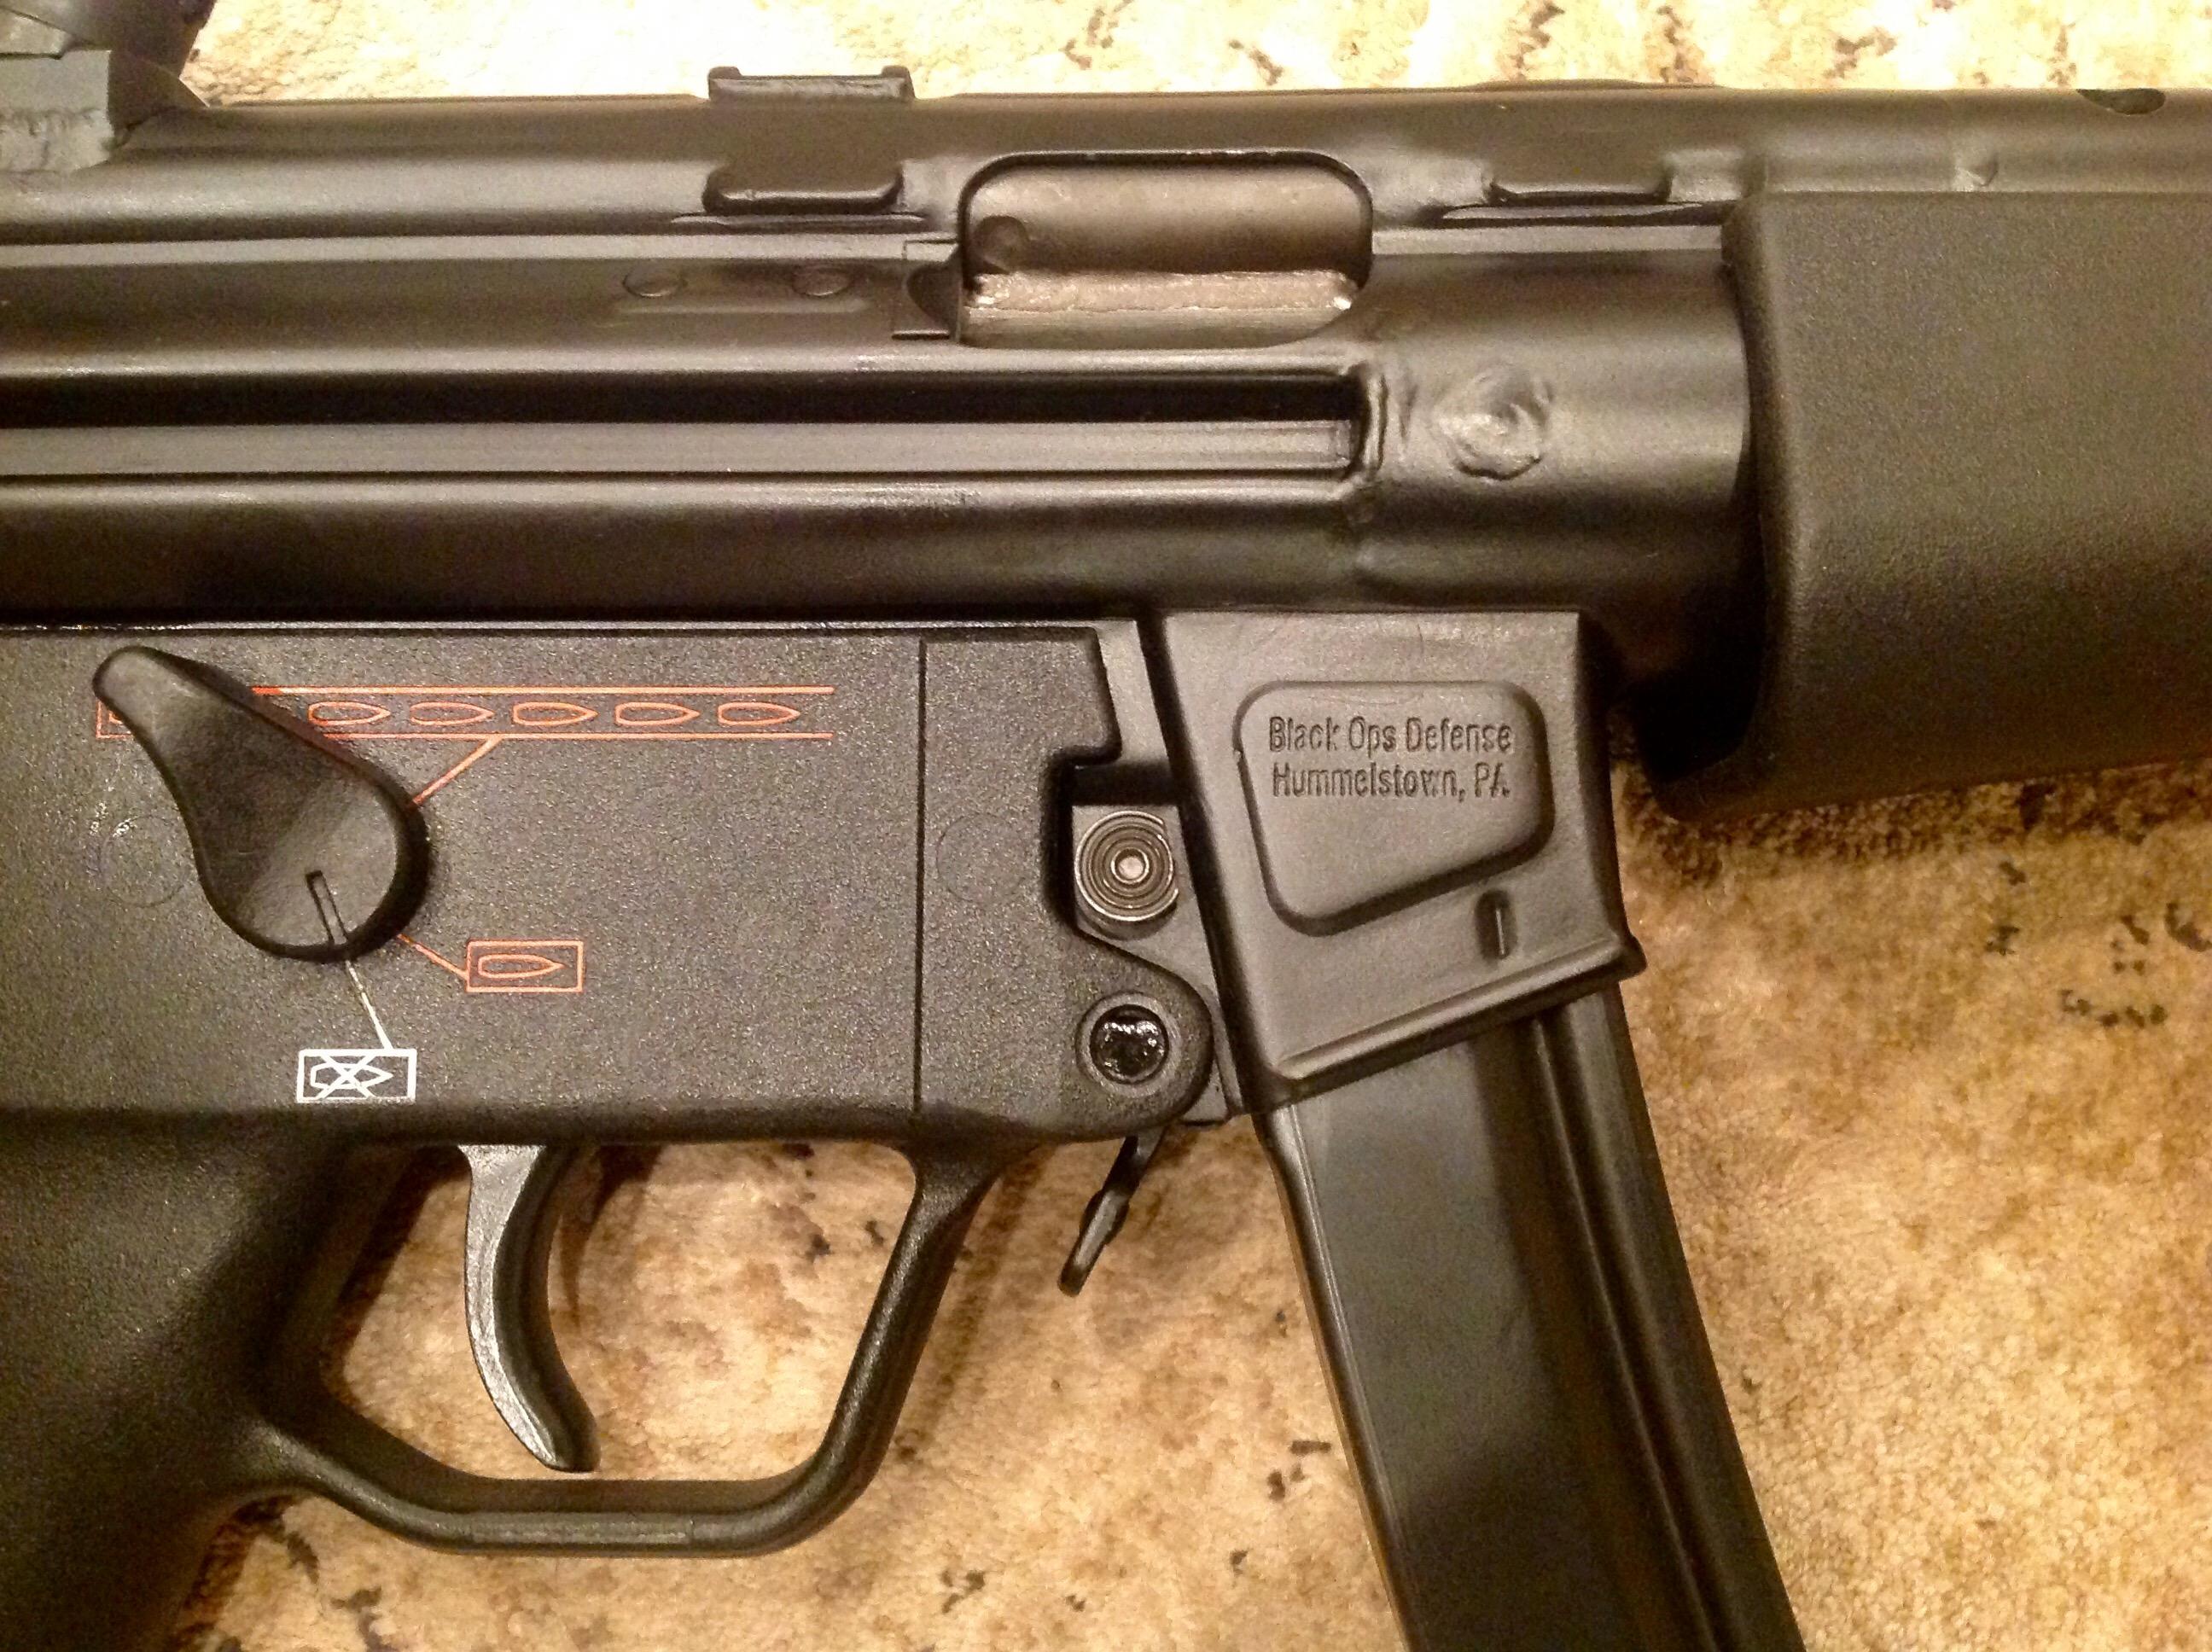 WTS: Black Ops Def MP-5 HK LSC kit build pistol 9mm